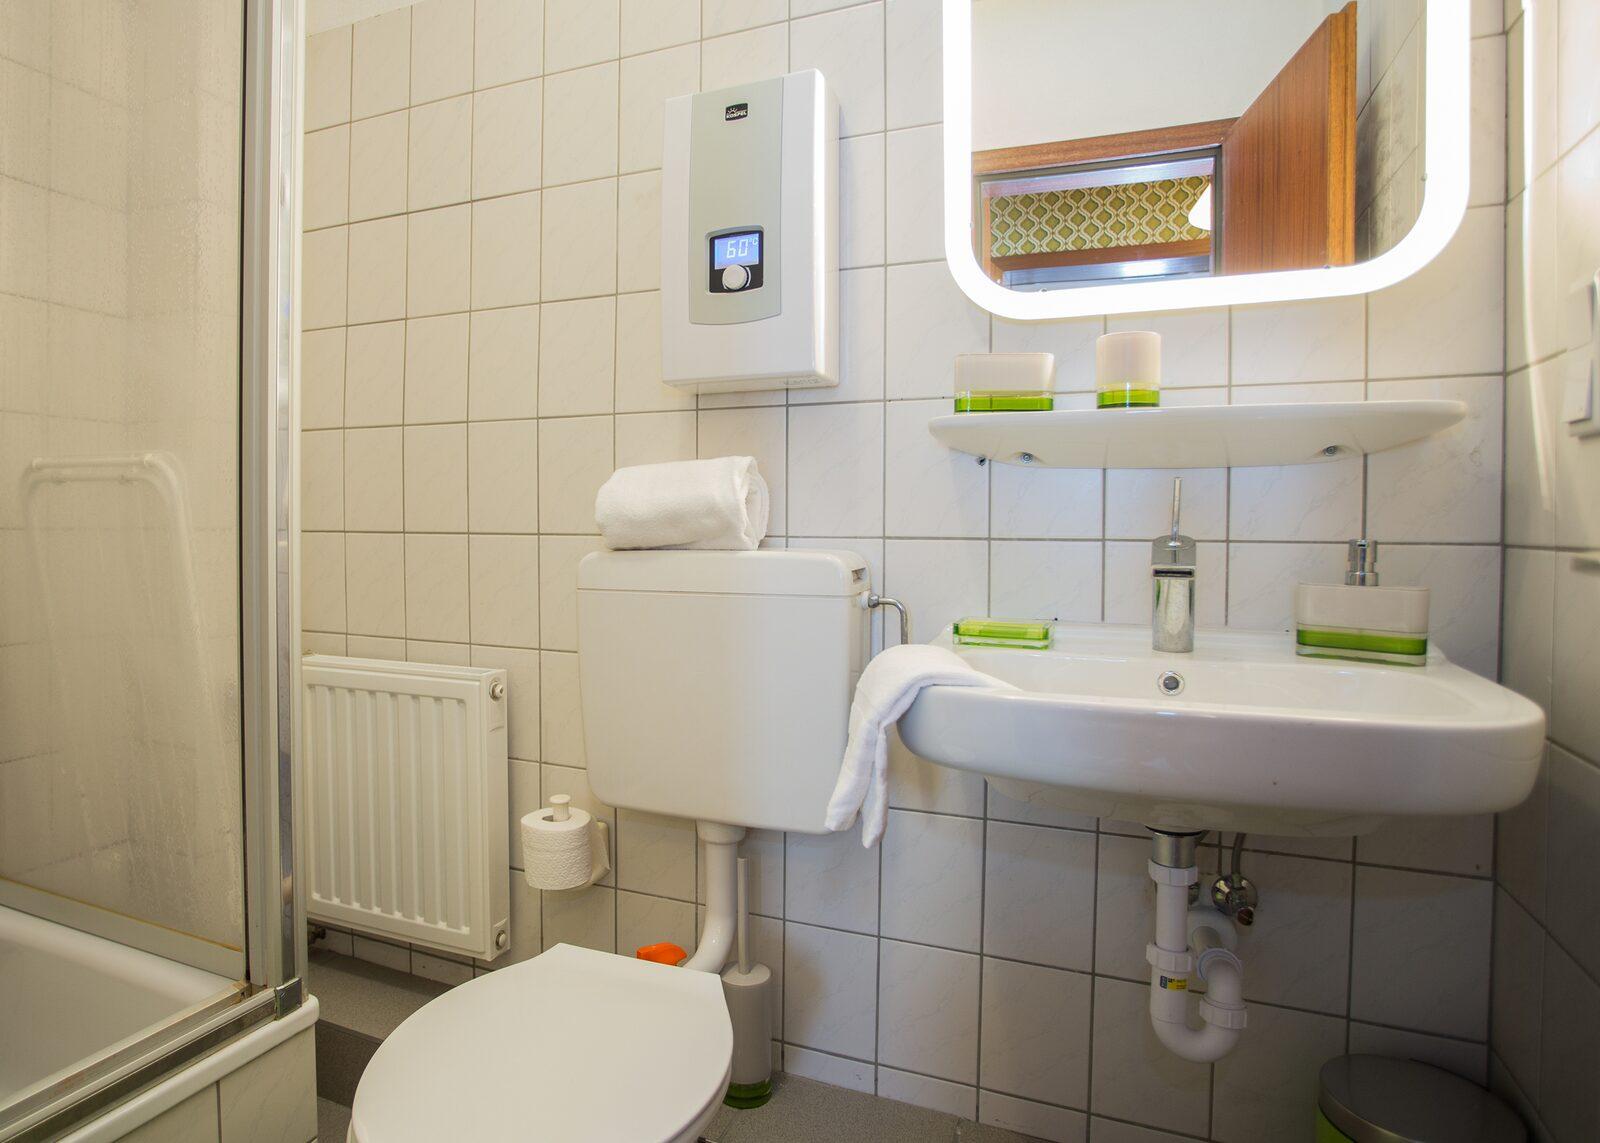 Appartement Regal - Brilonerstrasse 16 | Siedlinghausen-Winterberg 'Retro'